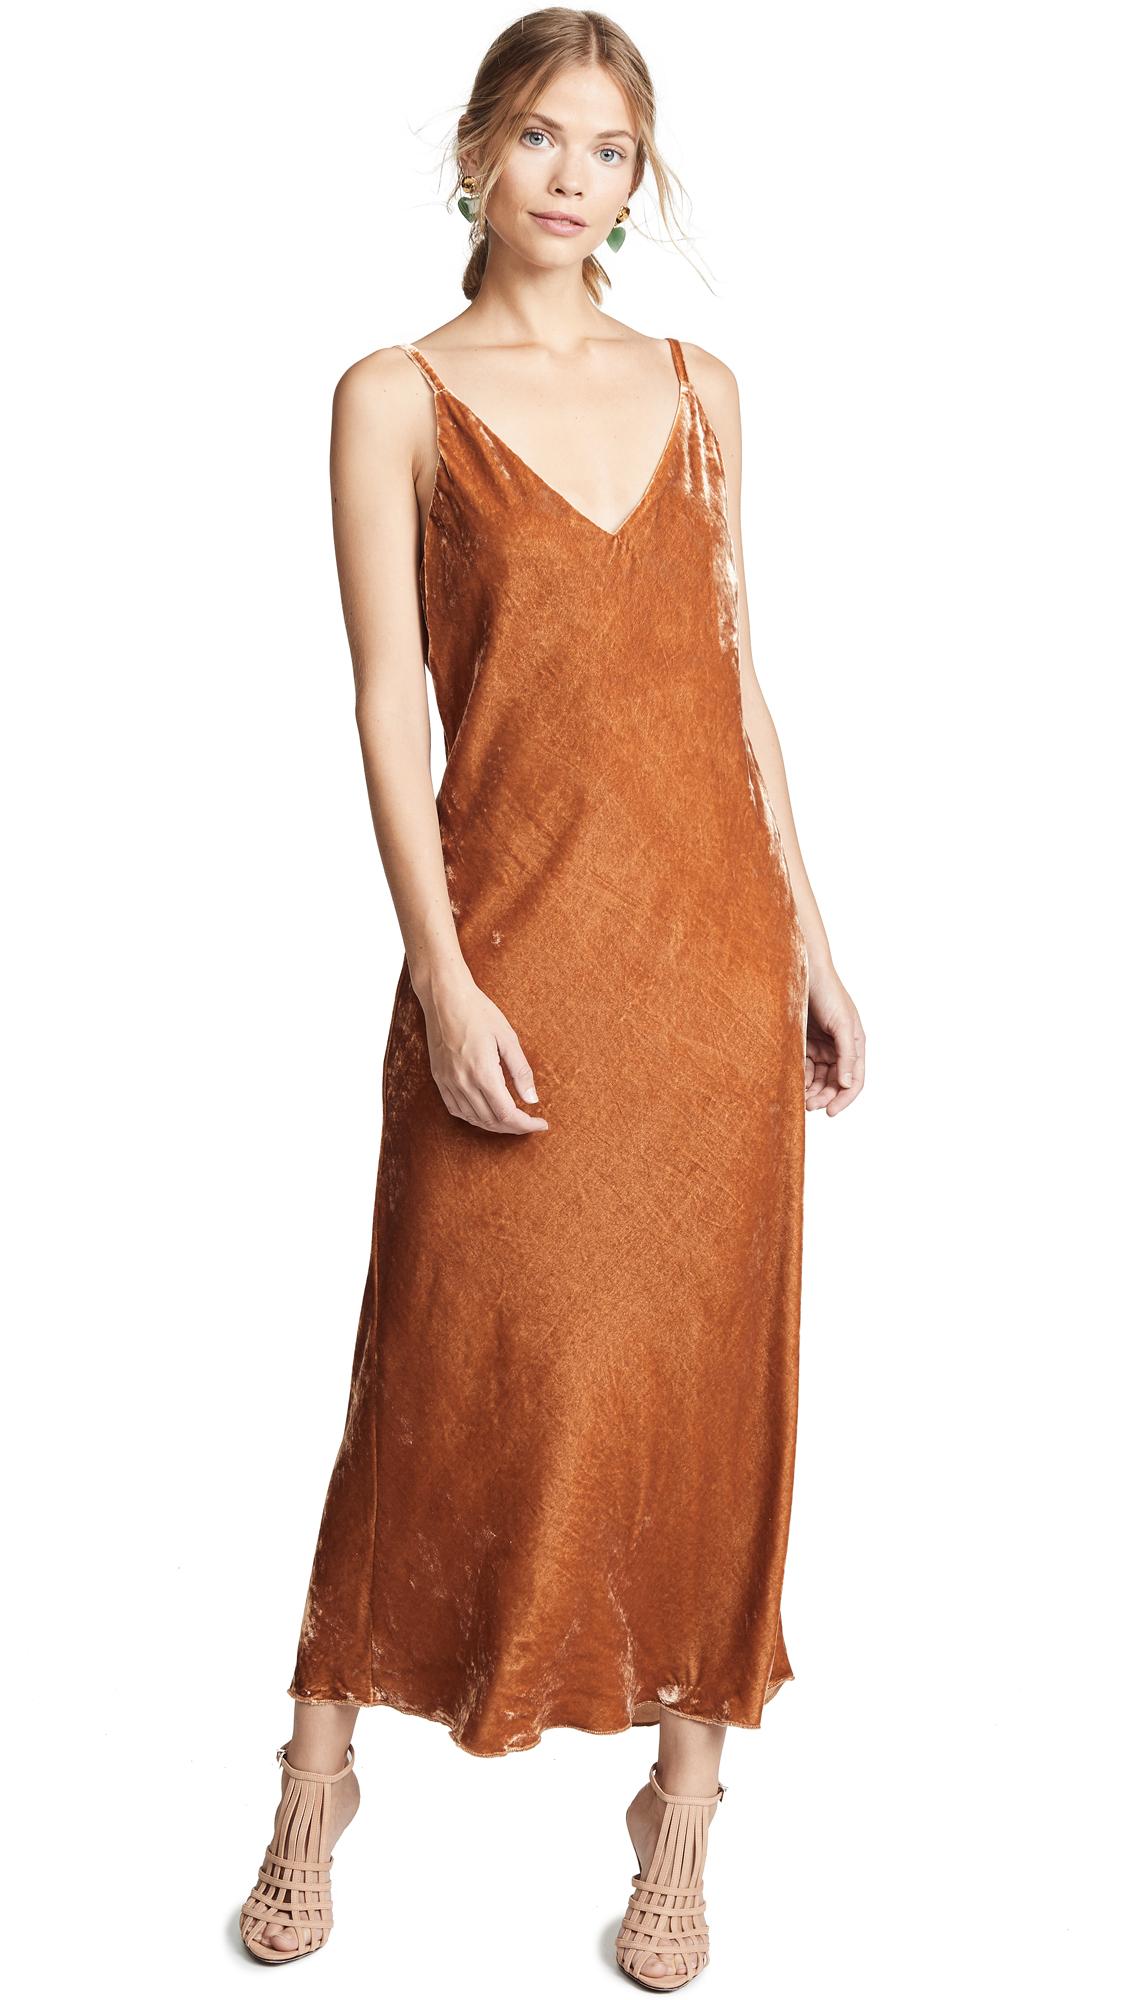 Debby Dress in Daino